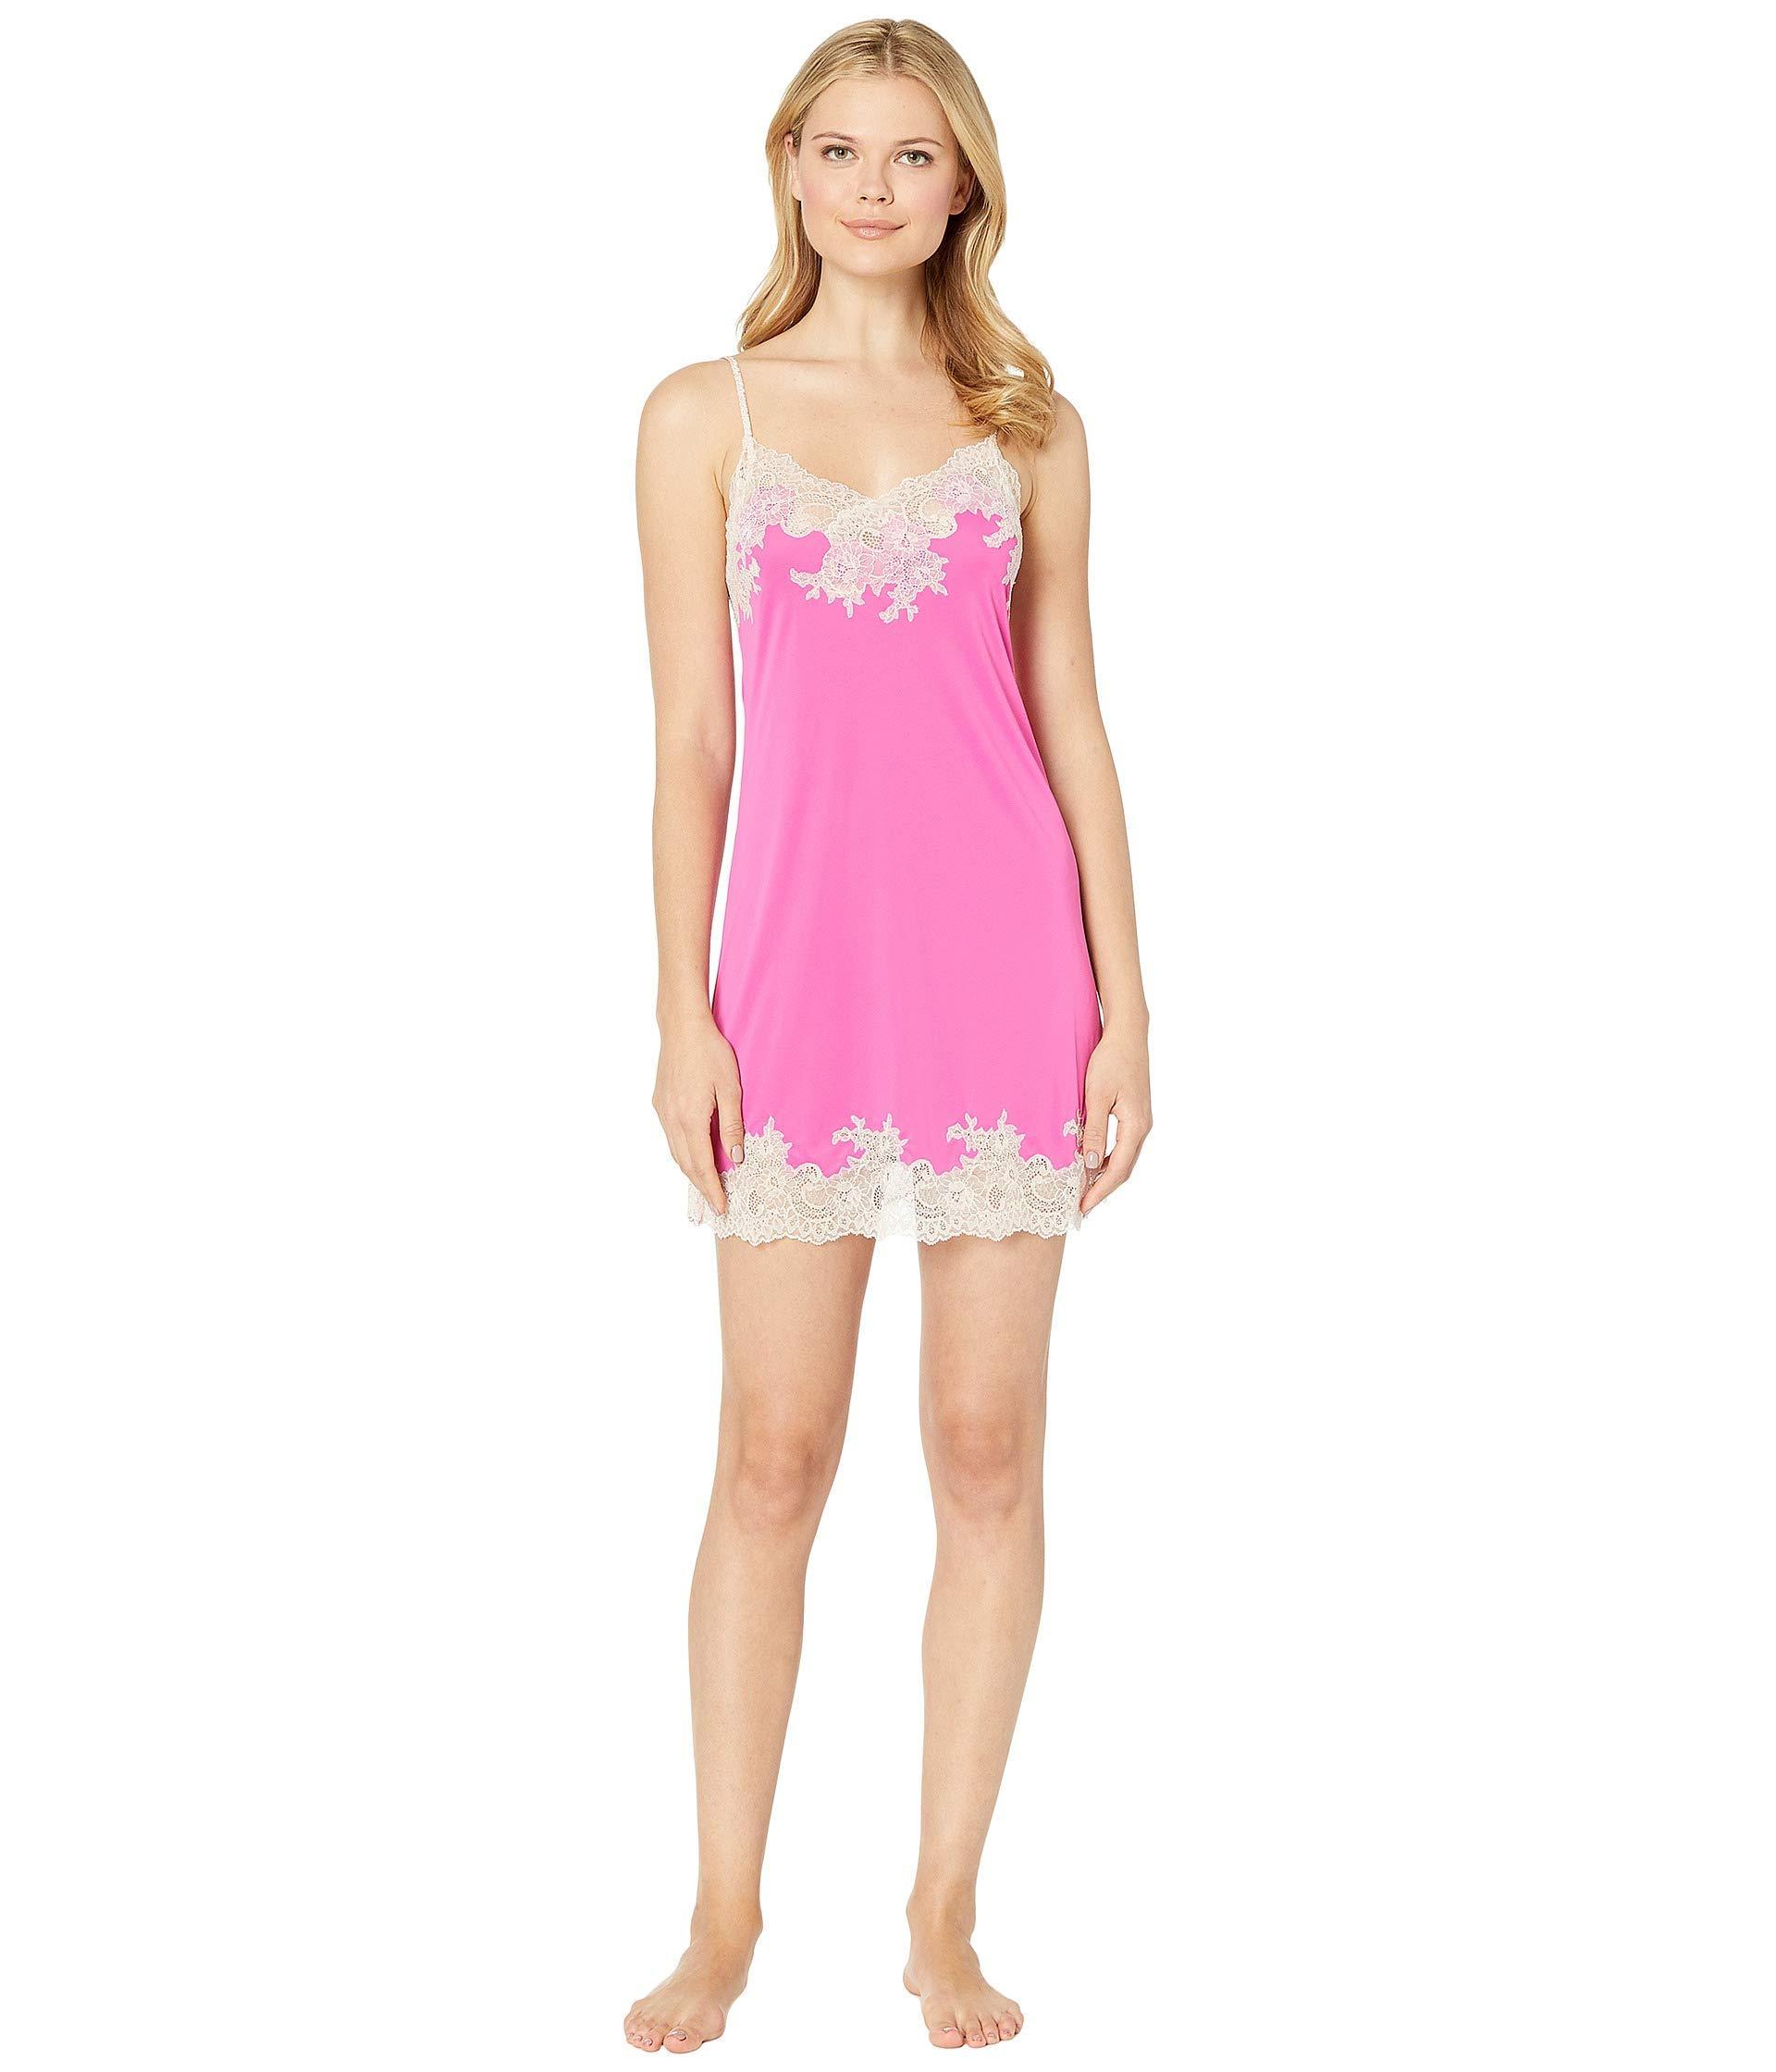 Lyst - Natori Enchant Lace Trim Chemise (vivid Pink) Women s Pajama ... 297046510